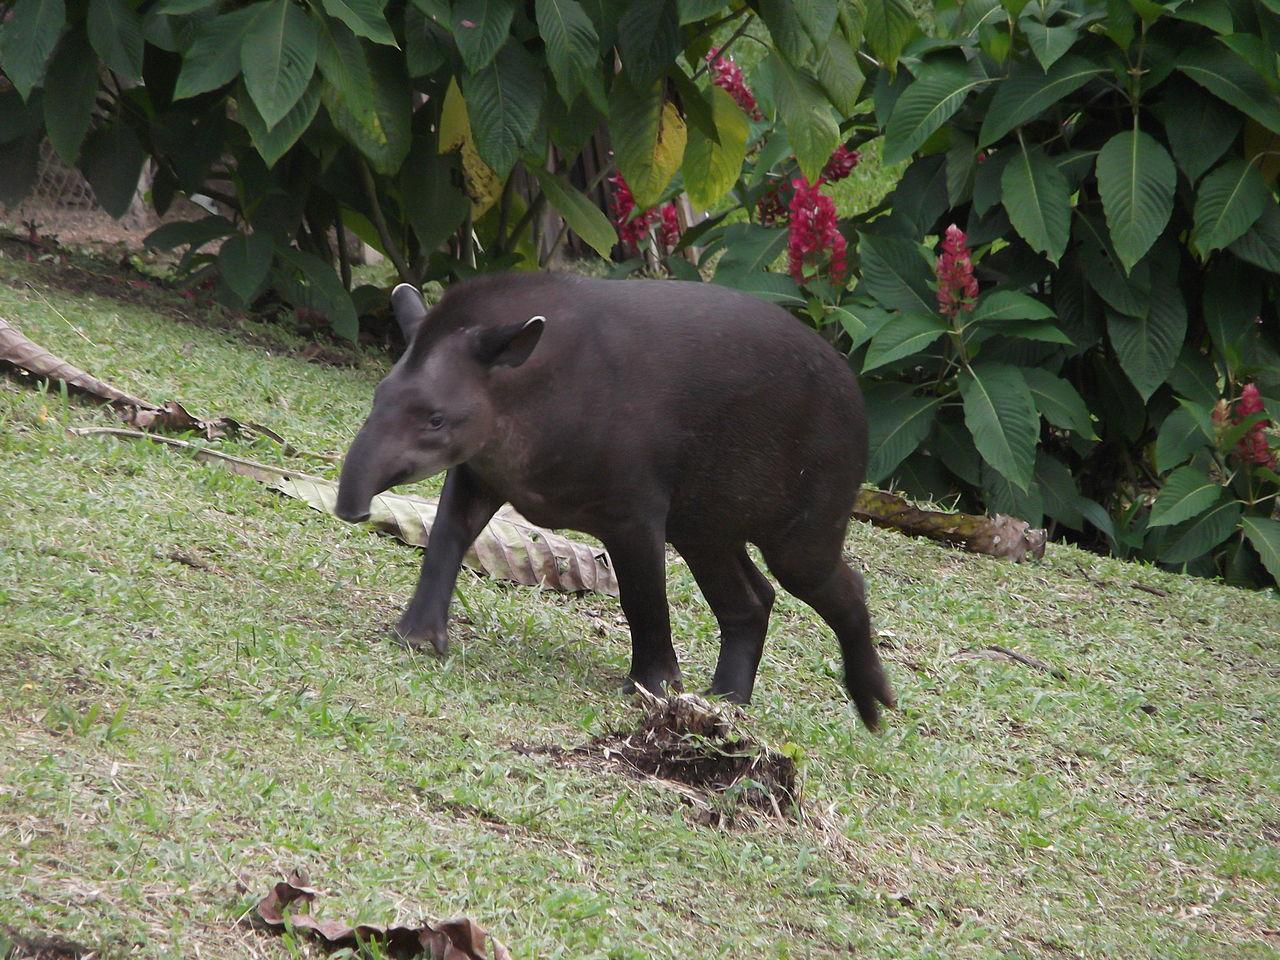 File:El Tapir en el Coca, Ecuador.jpg - Wikimedia Commons